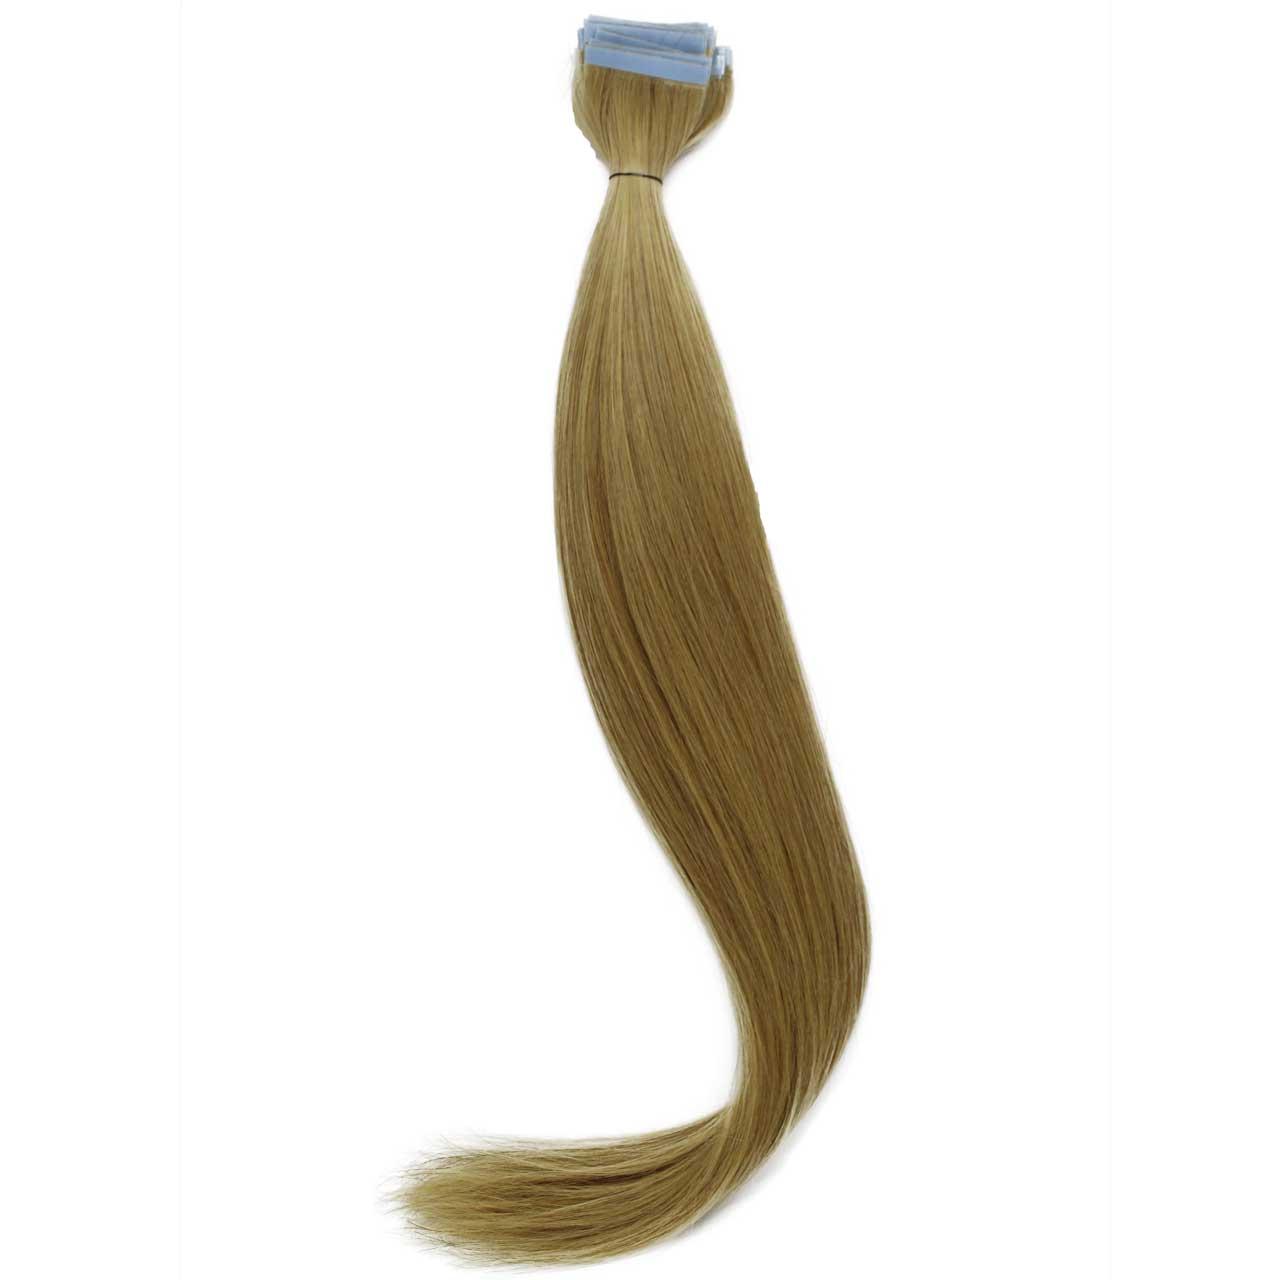 Mega Hair de Fita Adesiva Nano - Micro Pele Loiro Claro 100g Cabelo Humano Liso